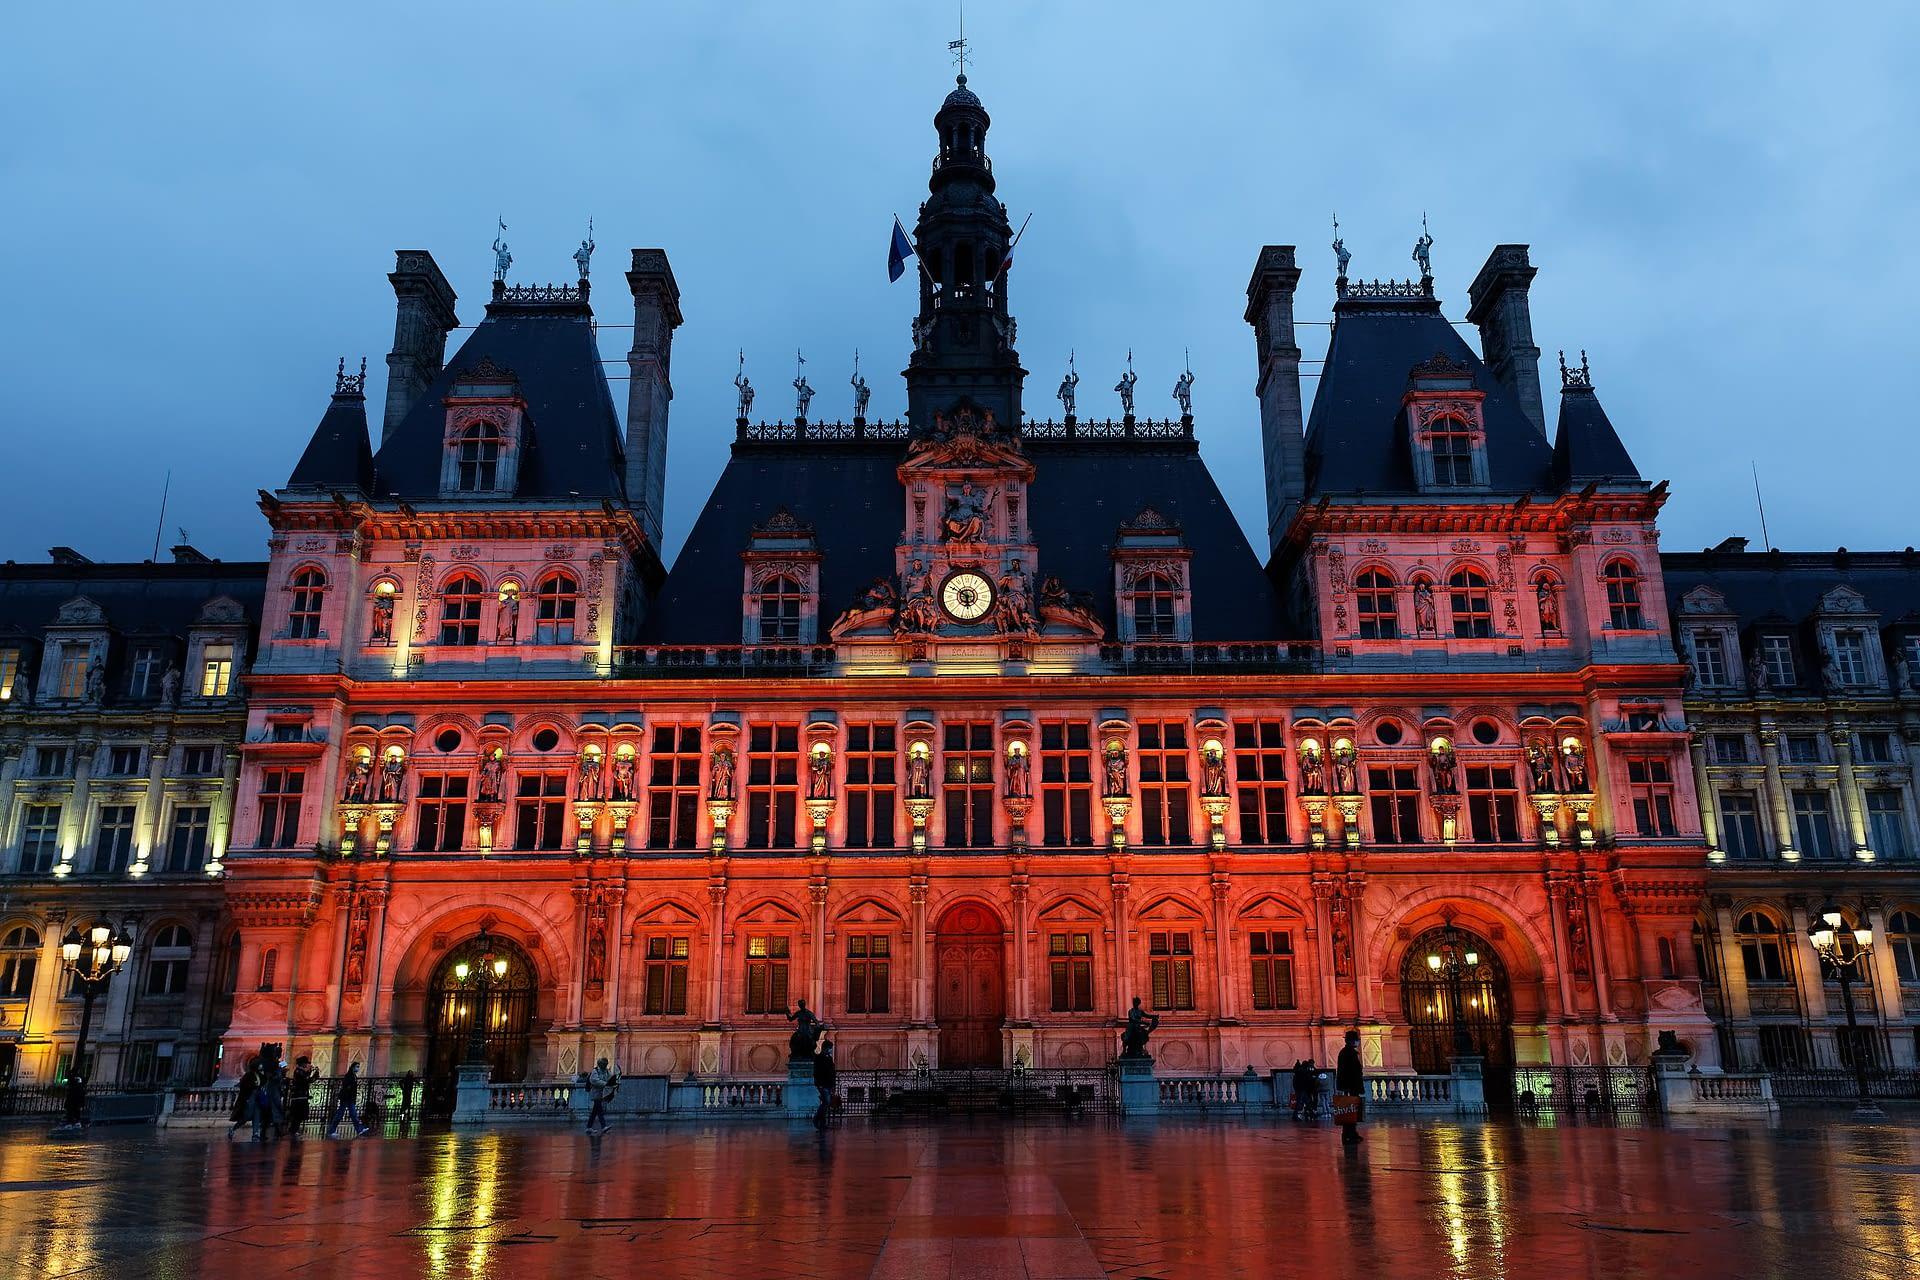 City Hall, Paris, France by Henri Garat